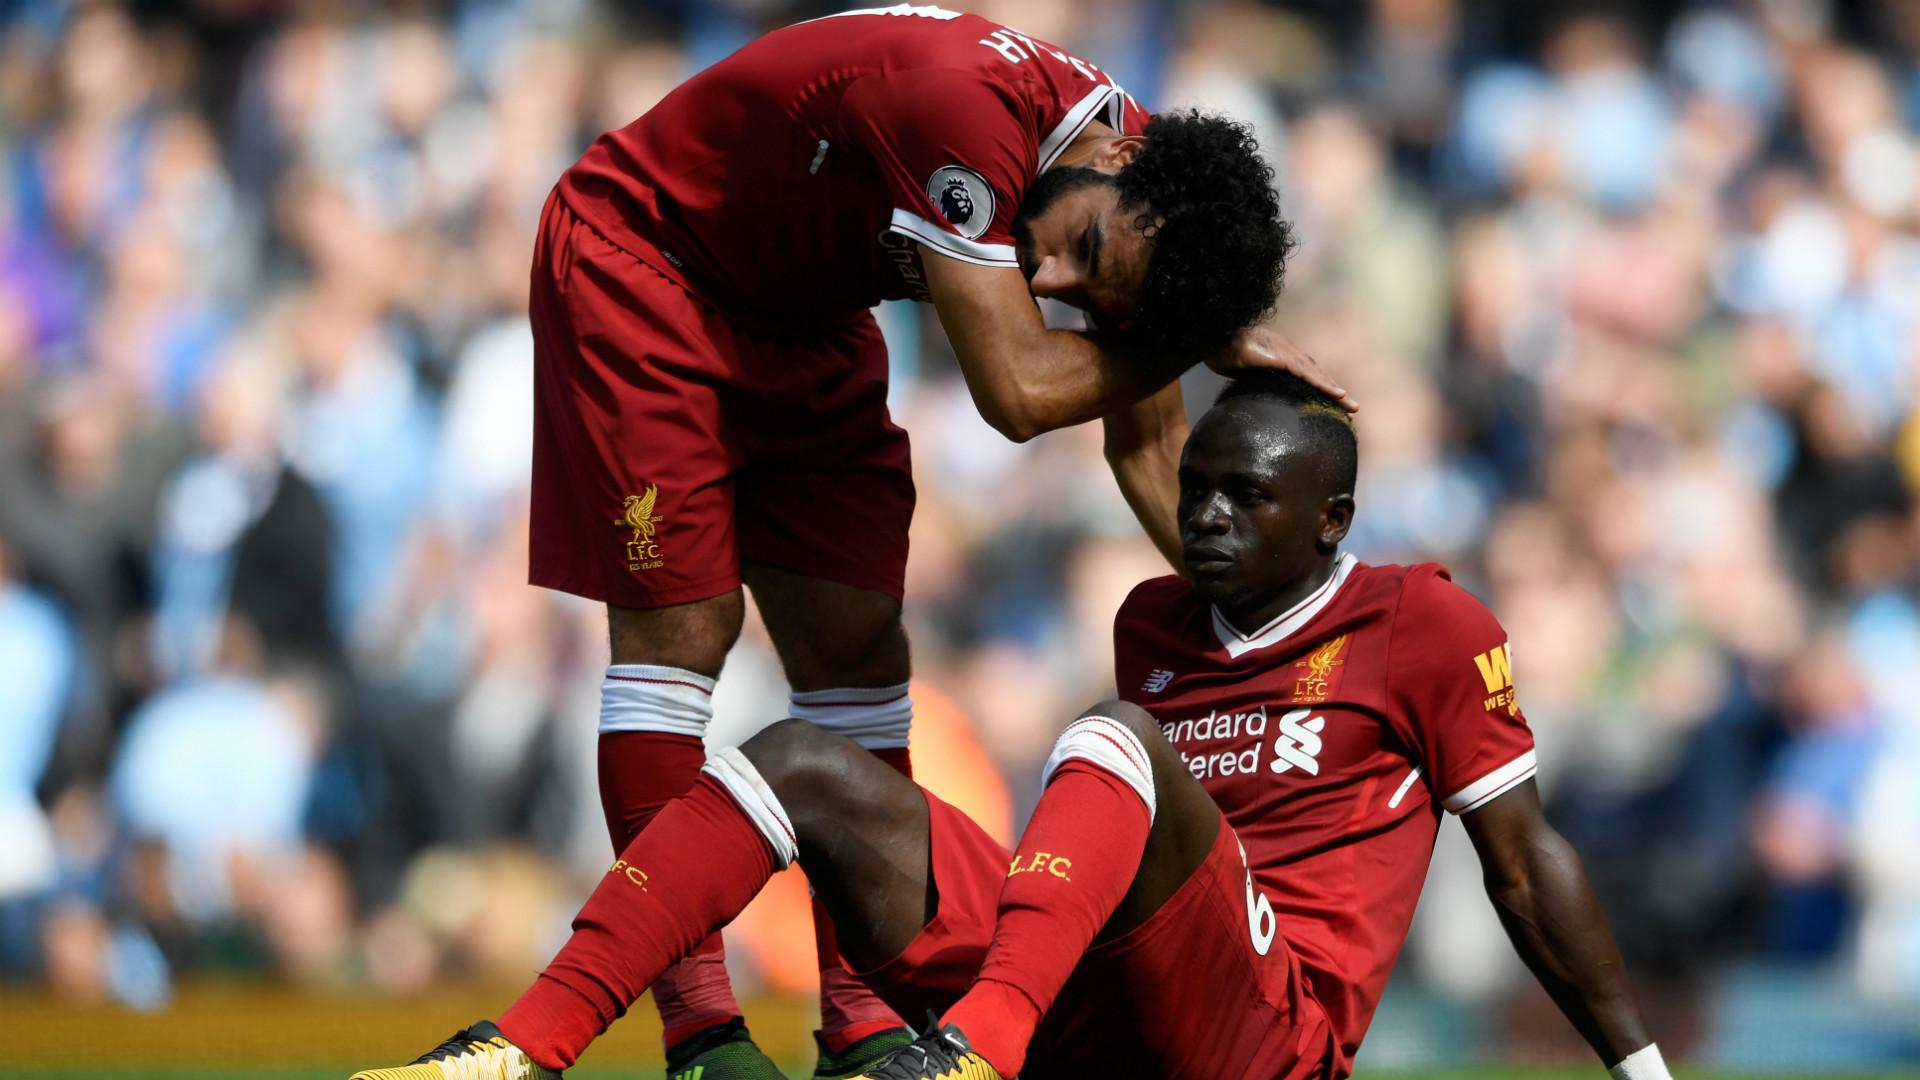 Sadio Mane Mohamed Salah Manchester City Liverpool